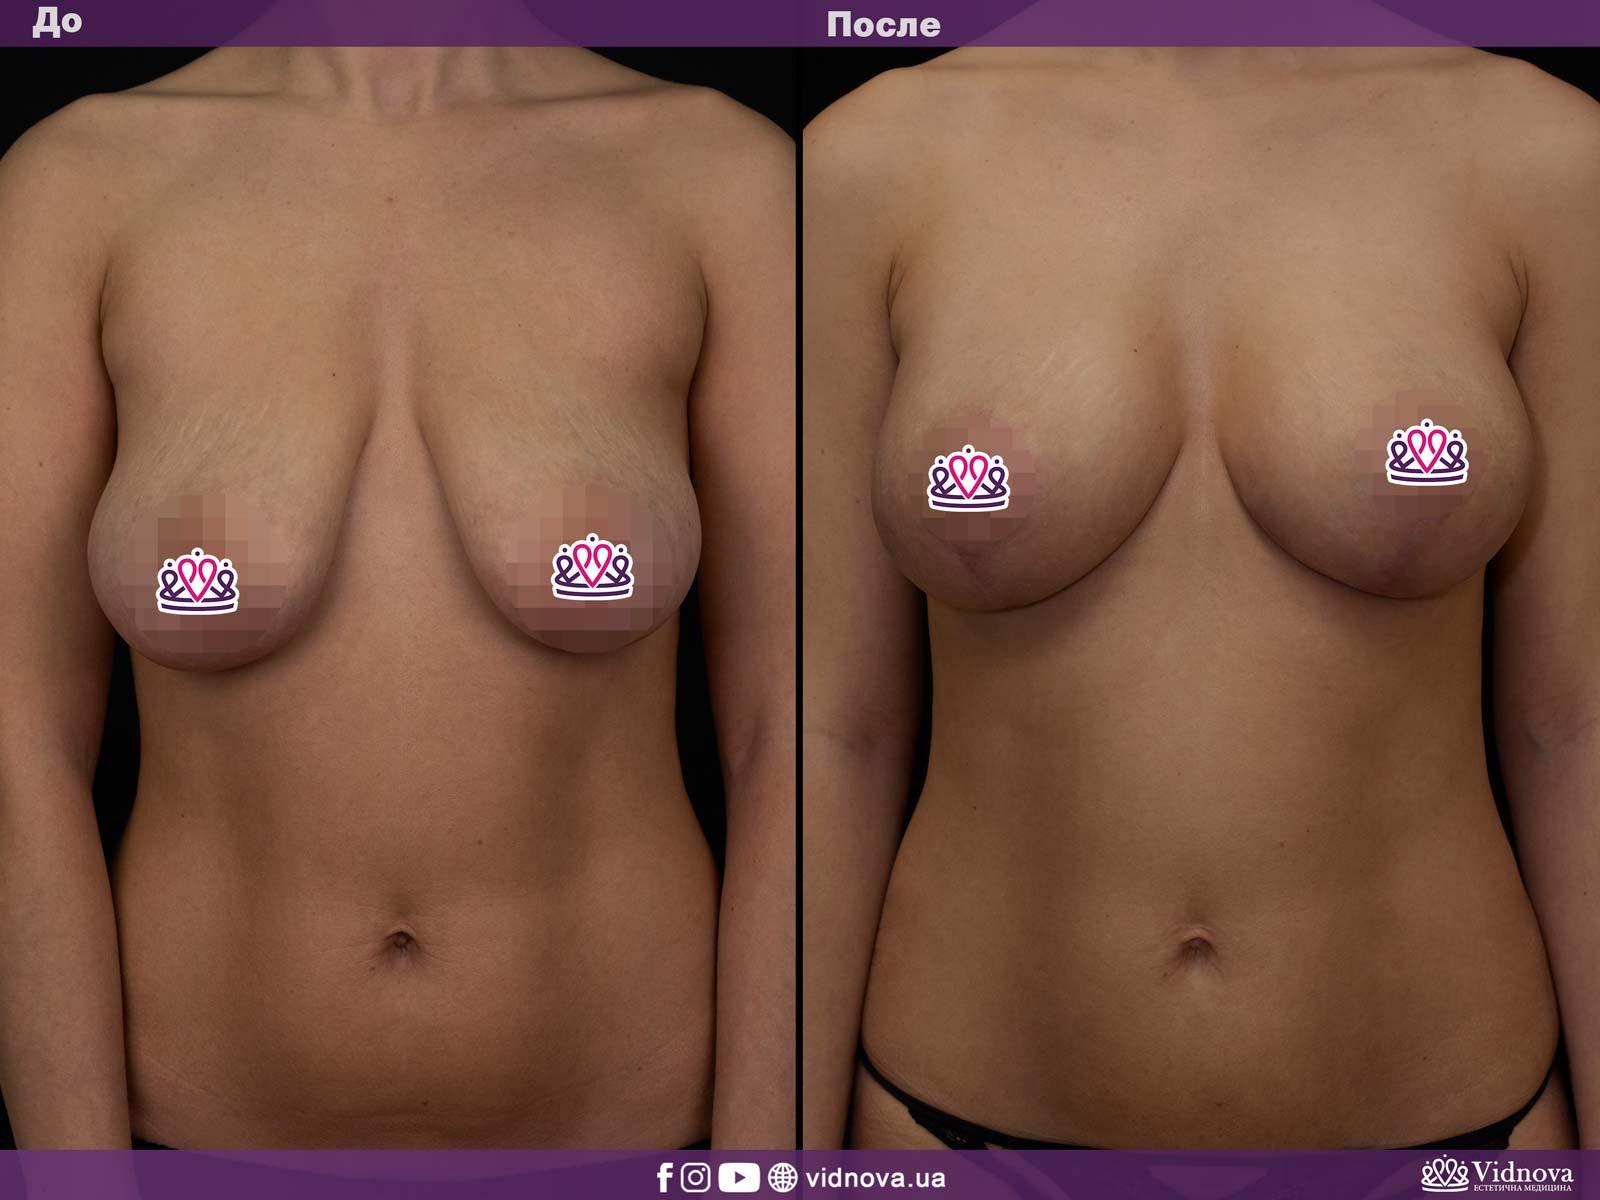 Подтяжка груди: Фото ДО и ПОСЛЕ - Пример №1-1 - Клиника Vidnova